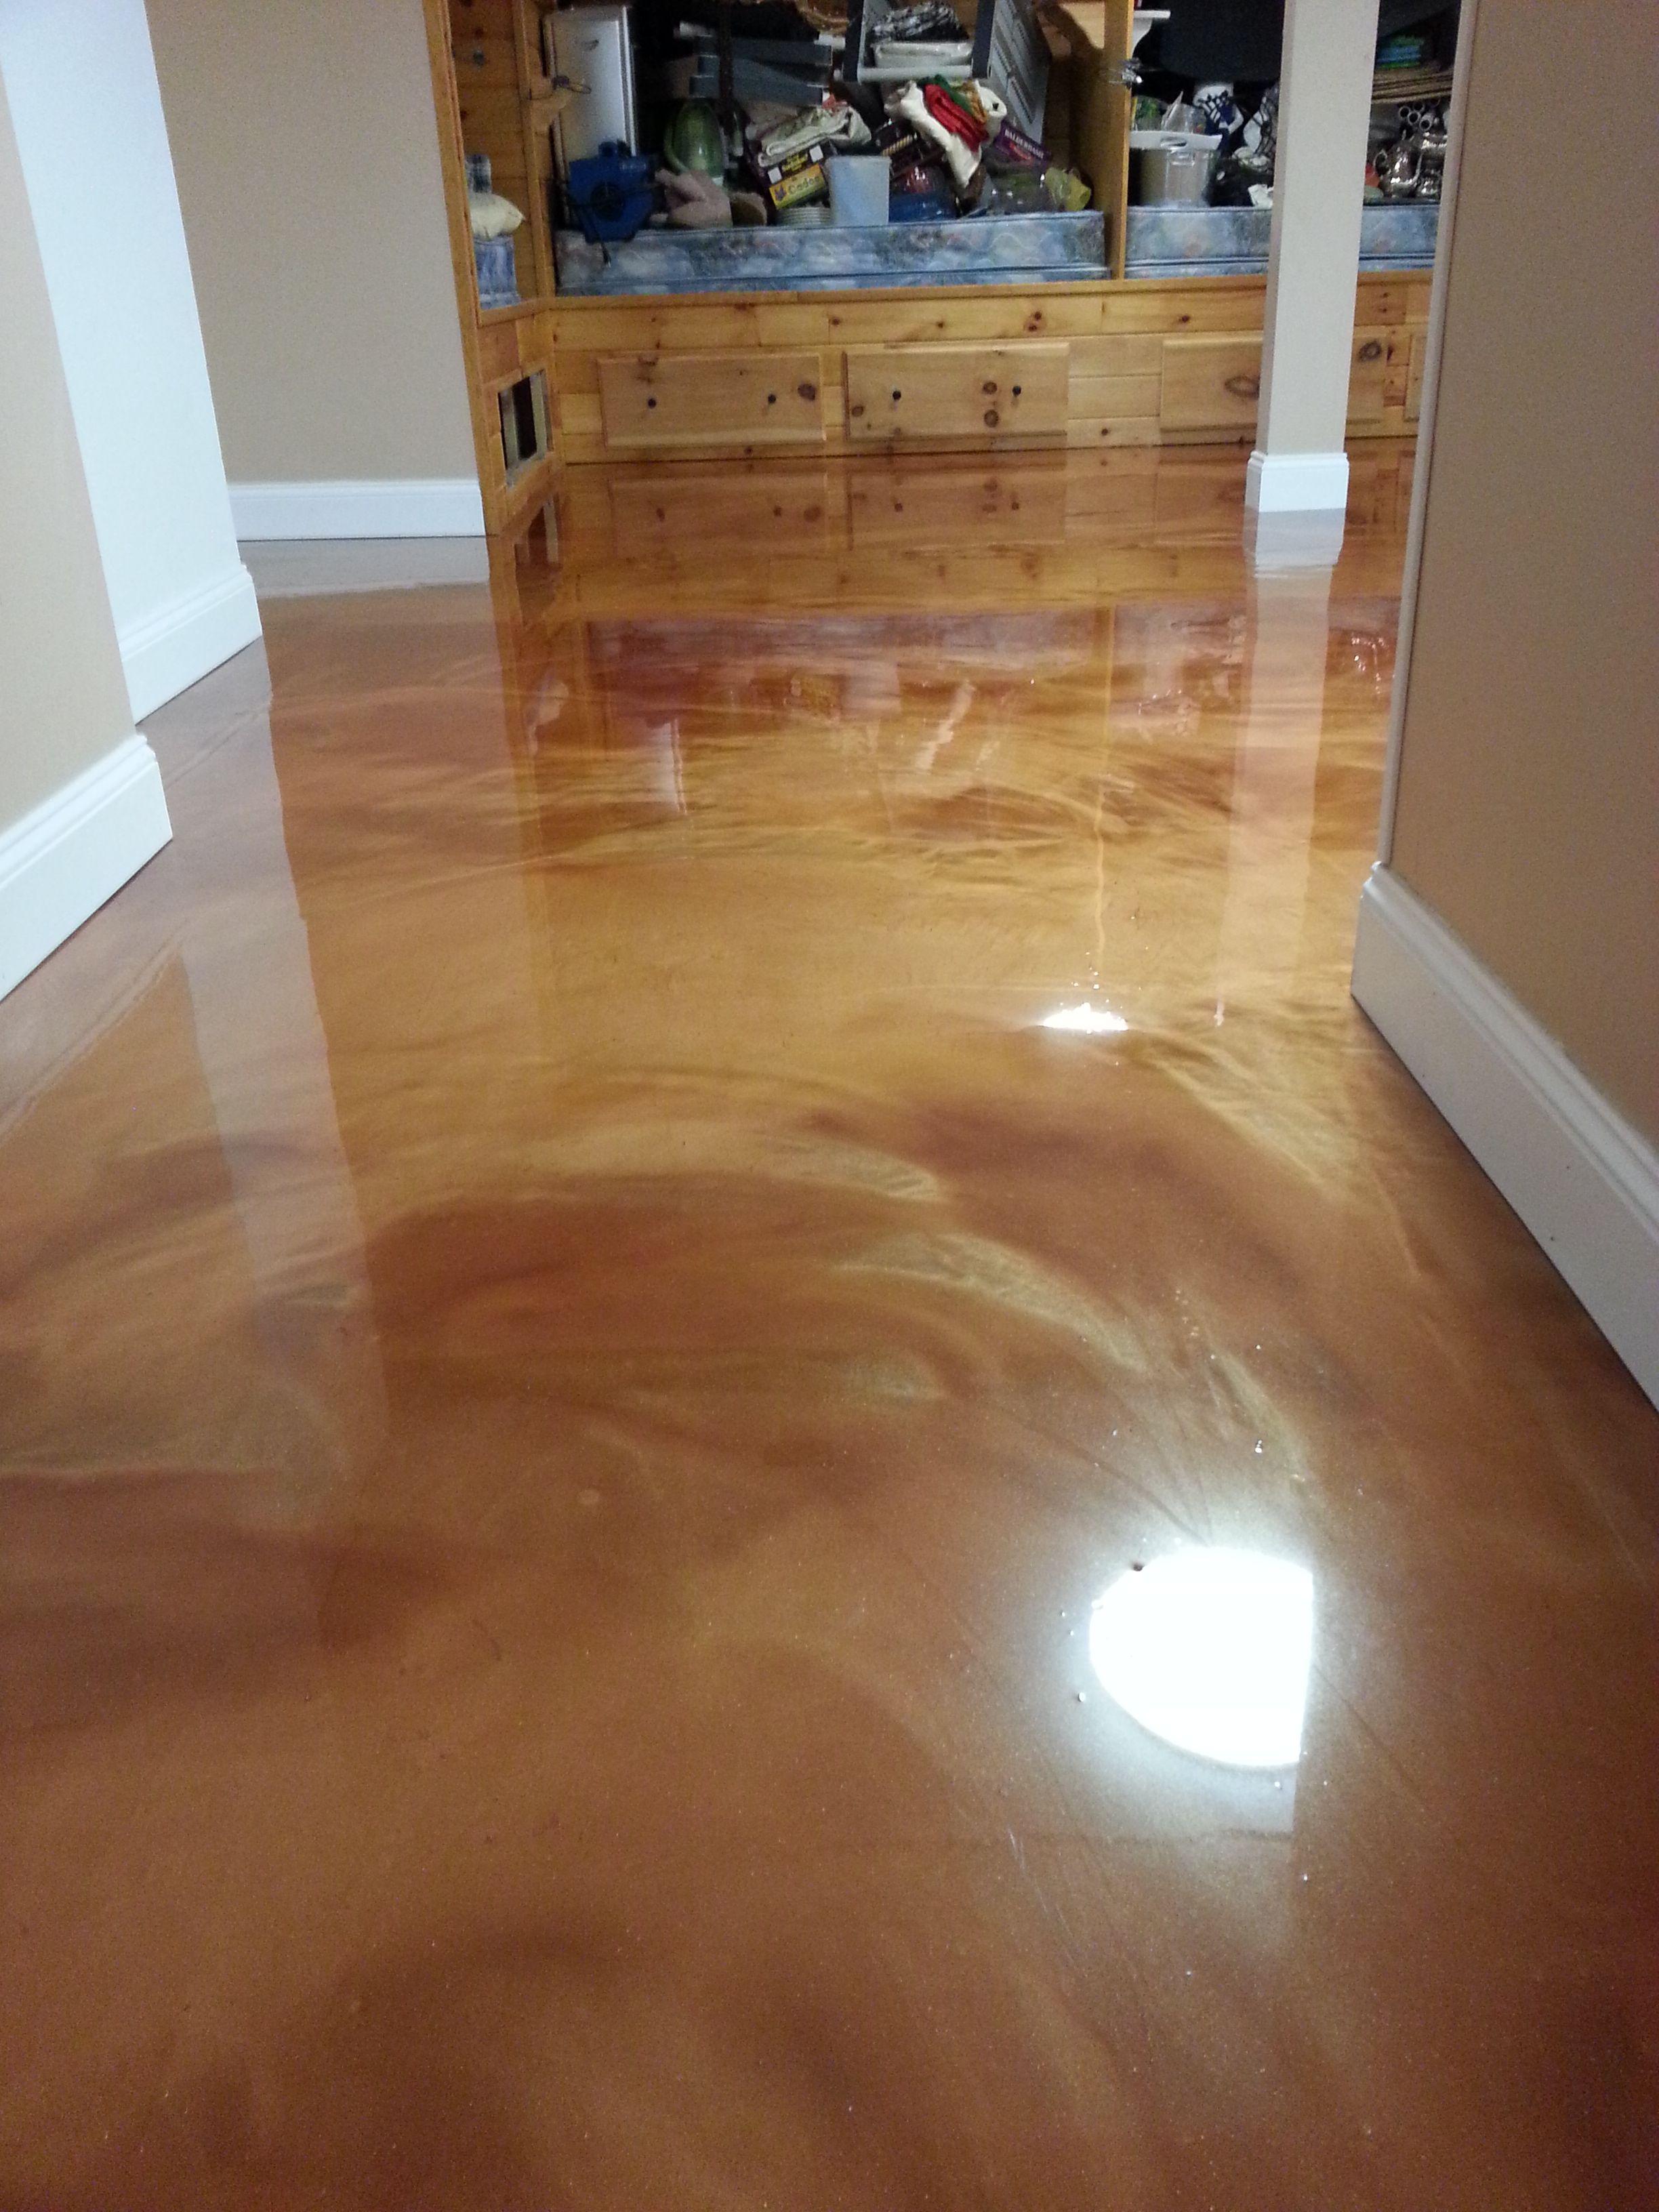 Metallic epoxy floor coating myrtle beach sc job - Interior design jobs myrtle beach sc ...